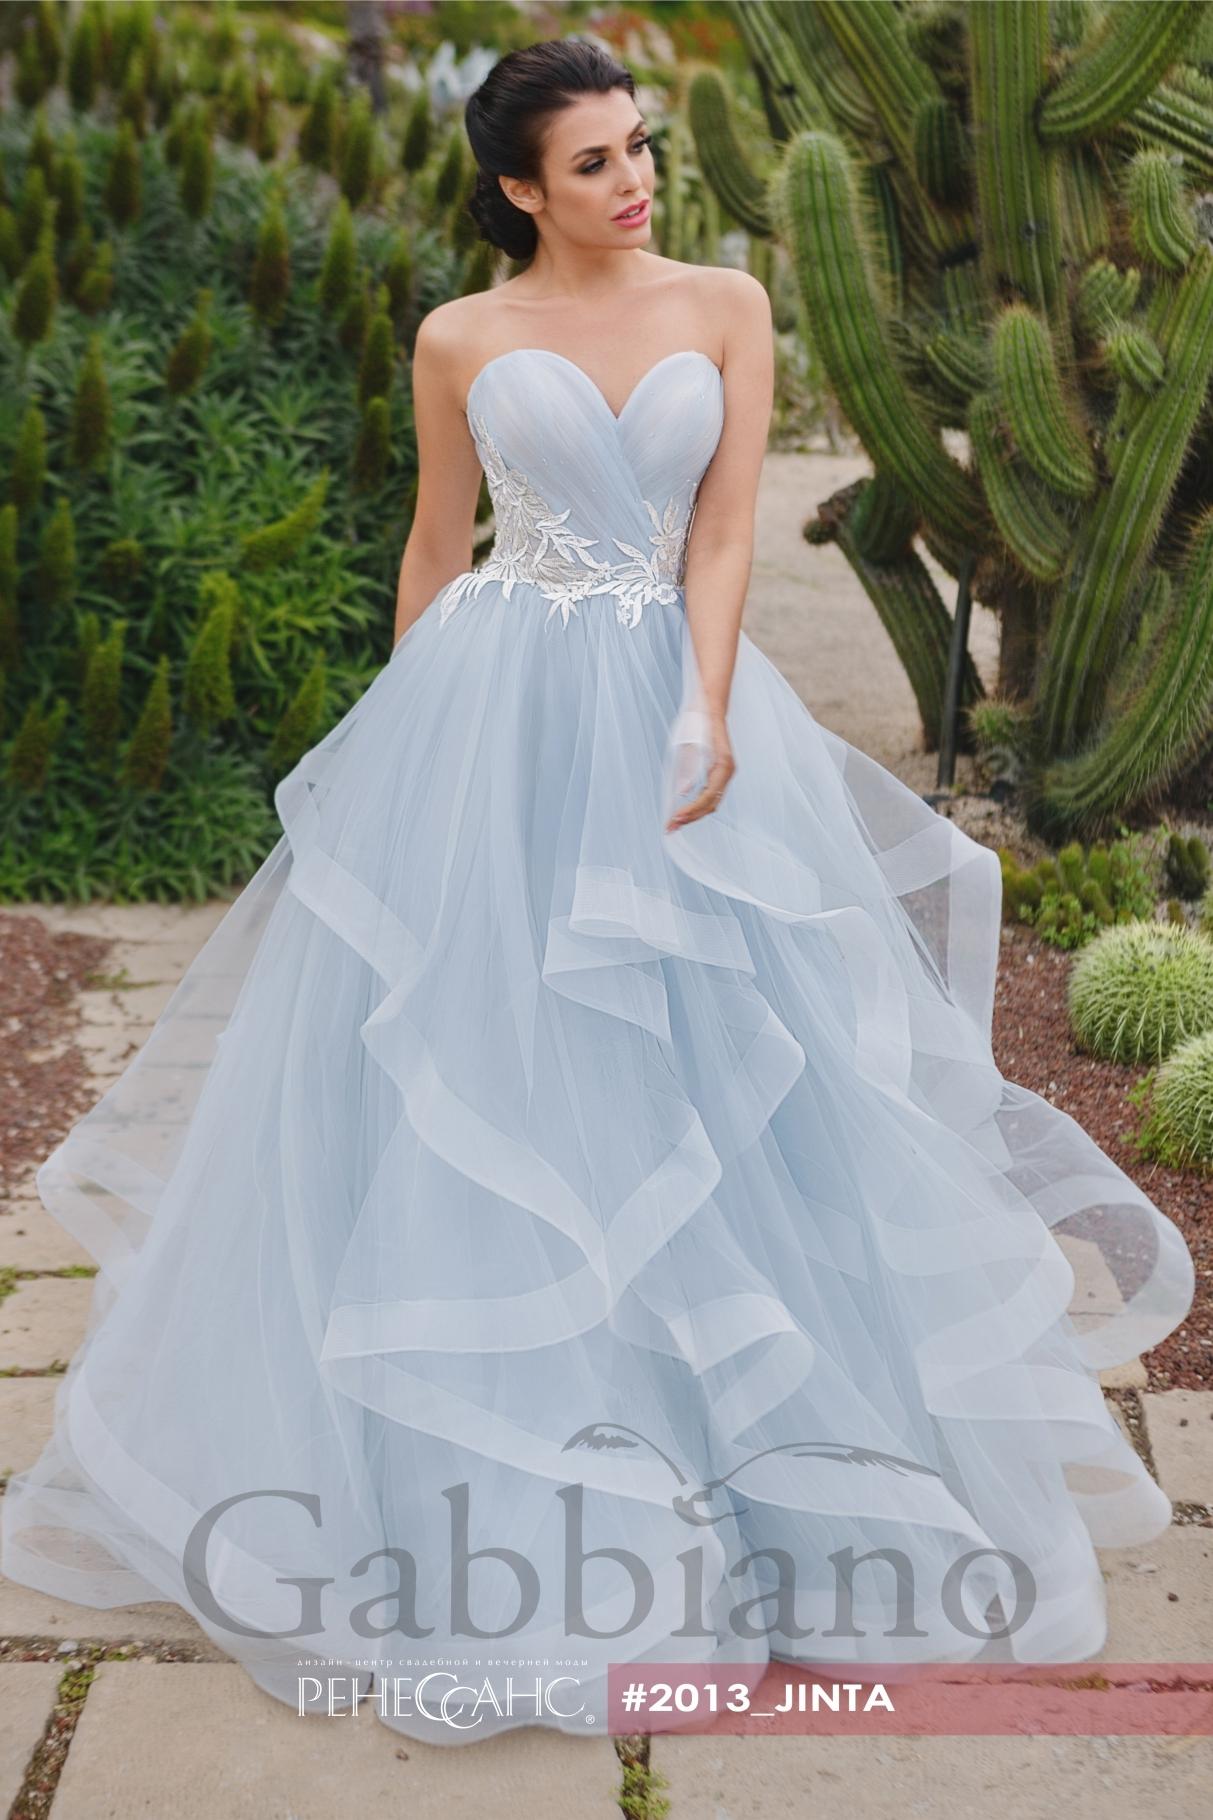 dbf653d5a36 2 фото. Jinta - Brand Gabbiano. Пышное свадебное платье ...